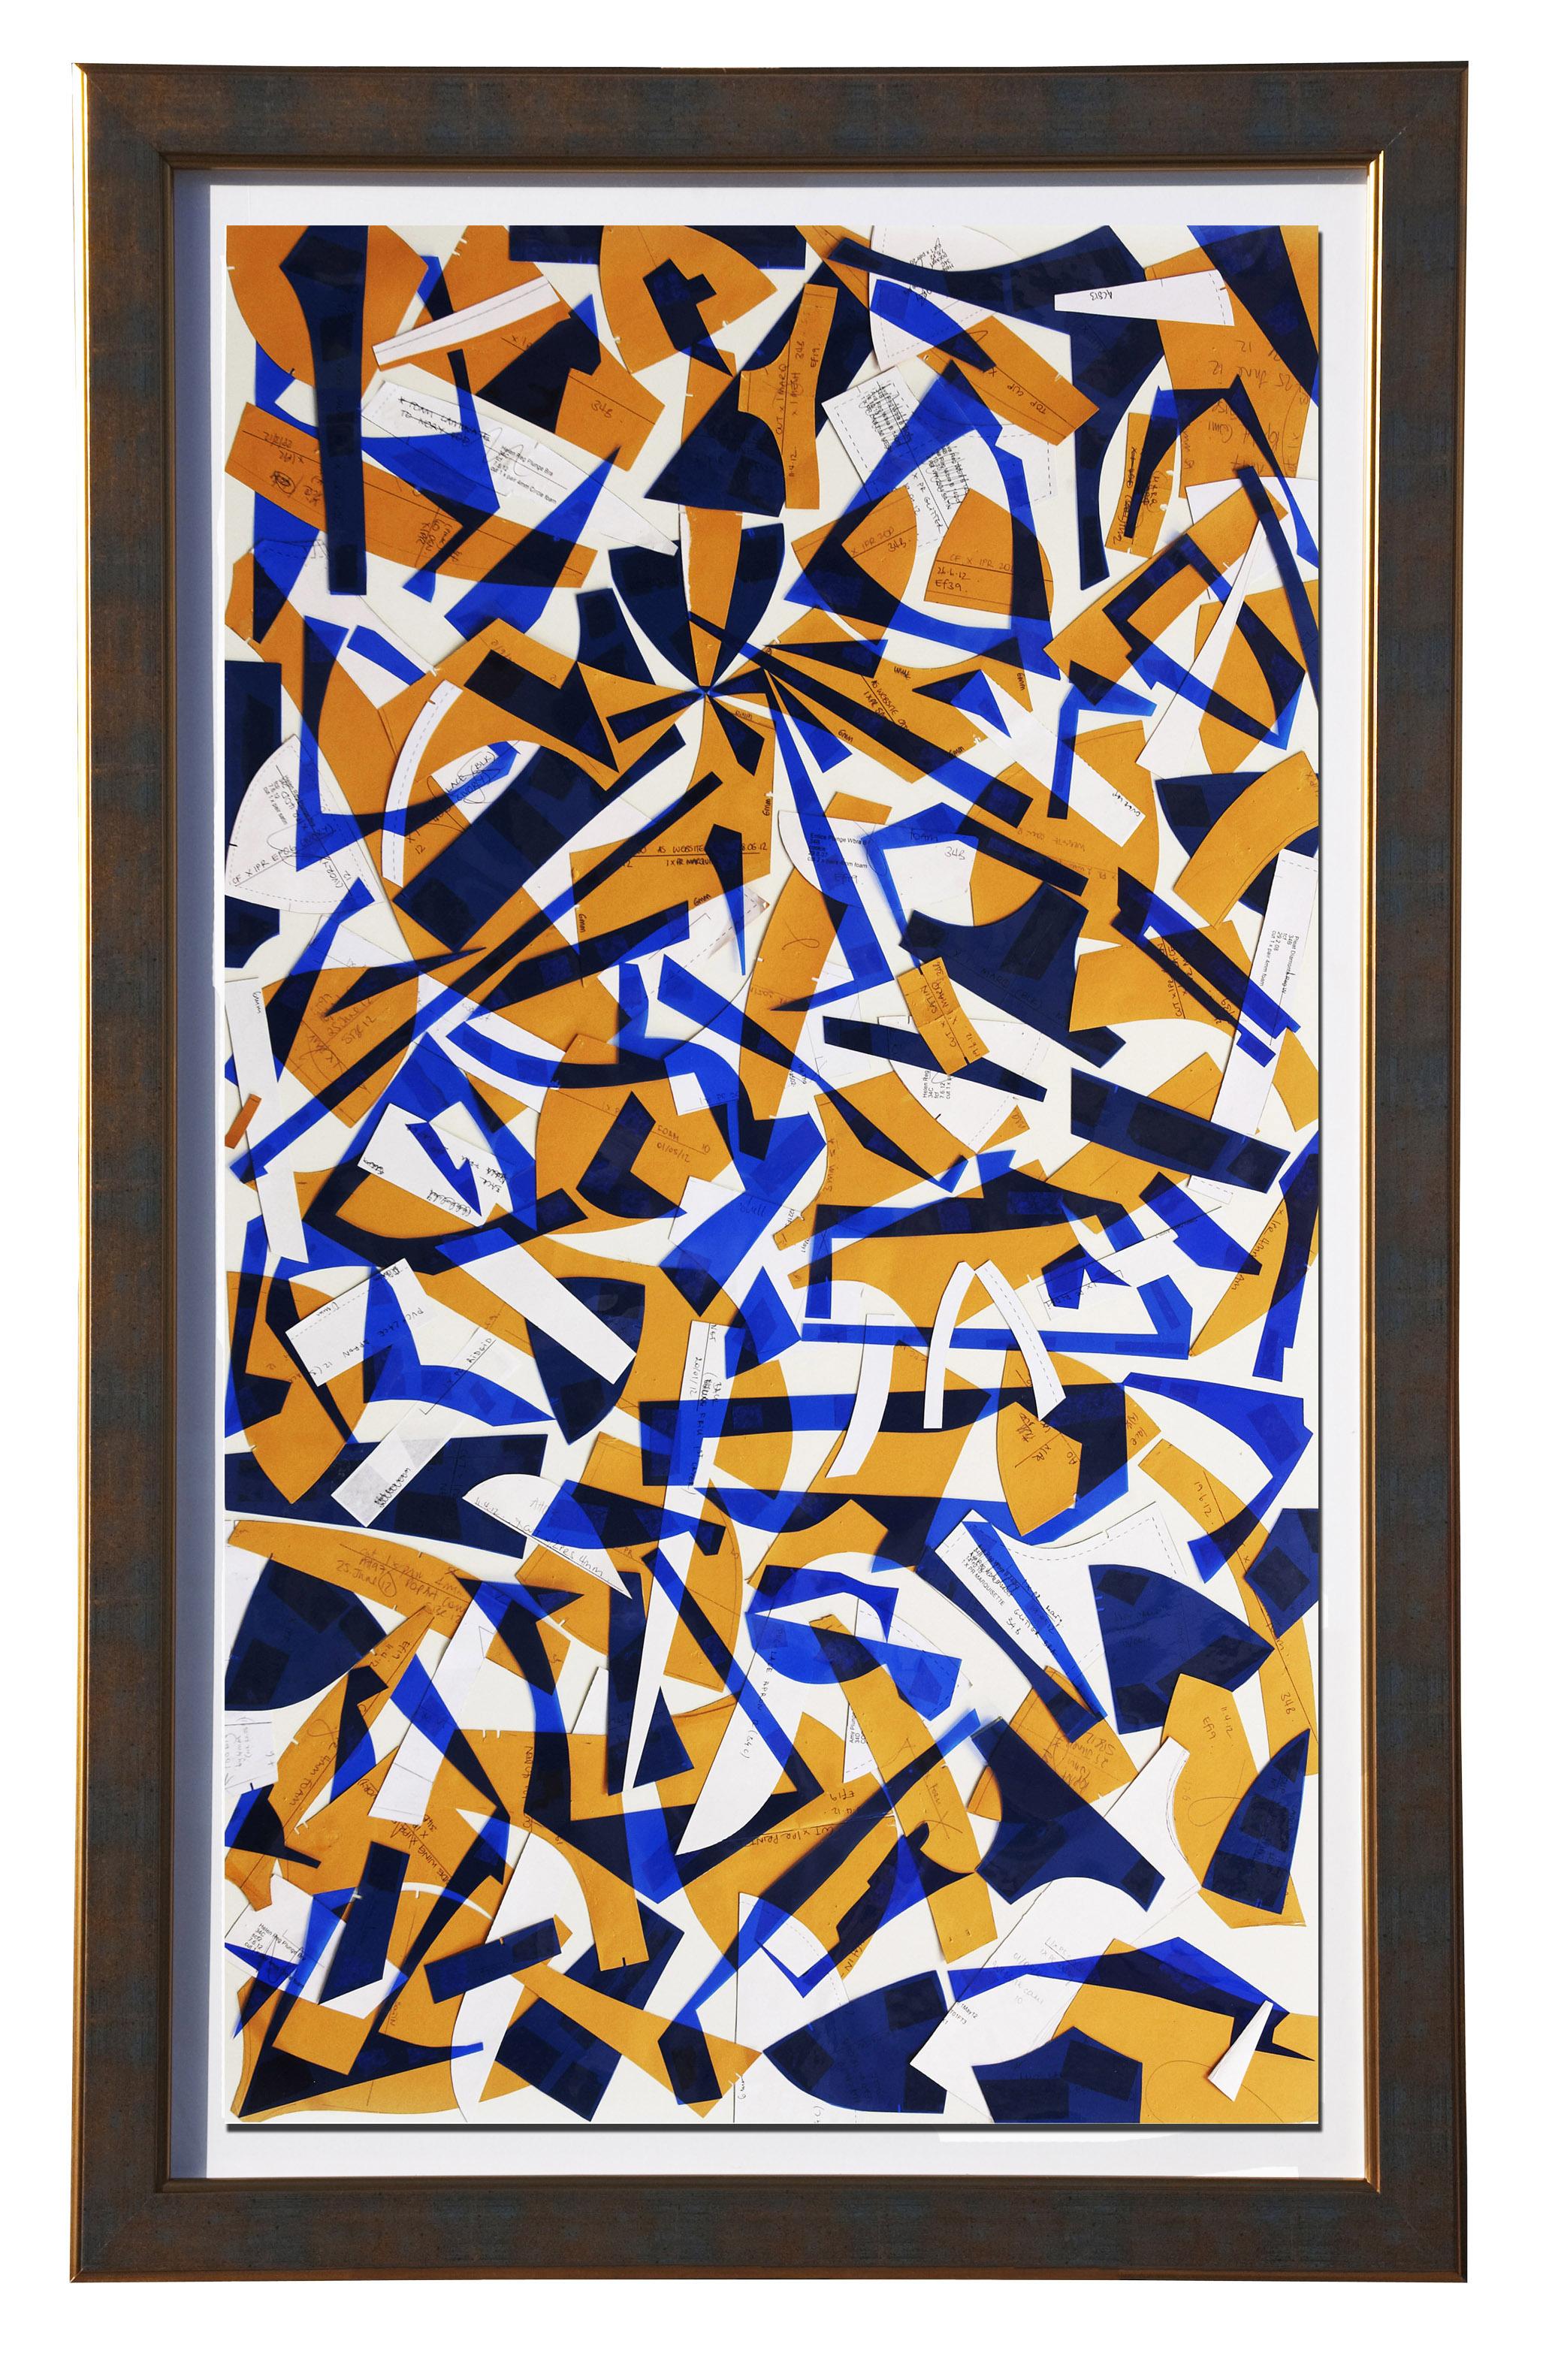 Seducing Matisse-Hormazd Narielwalla.jpg